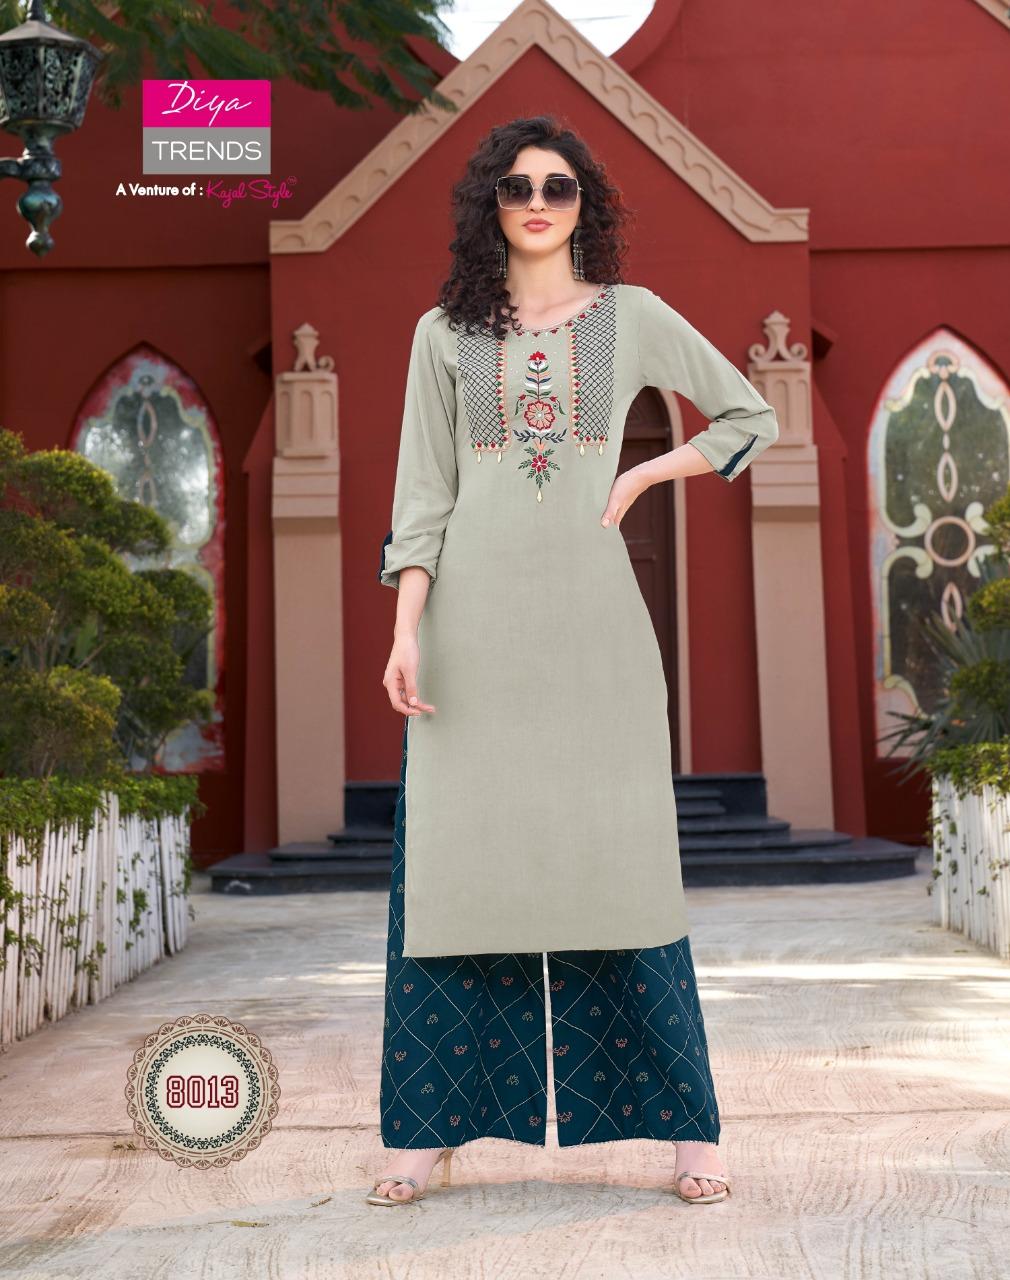 Diya Trends Bibas Vol 8 by Kajal Style Kurti with Palazzo Pant Wholesale Catalog 14 Pcs 6 - Diya Trends Biba's Vol 8 by Kajal Style Kurti with Palazzo Pant Wholesale Catalog 14 Pcs